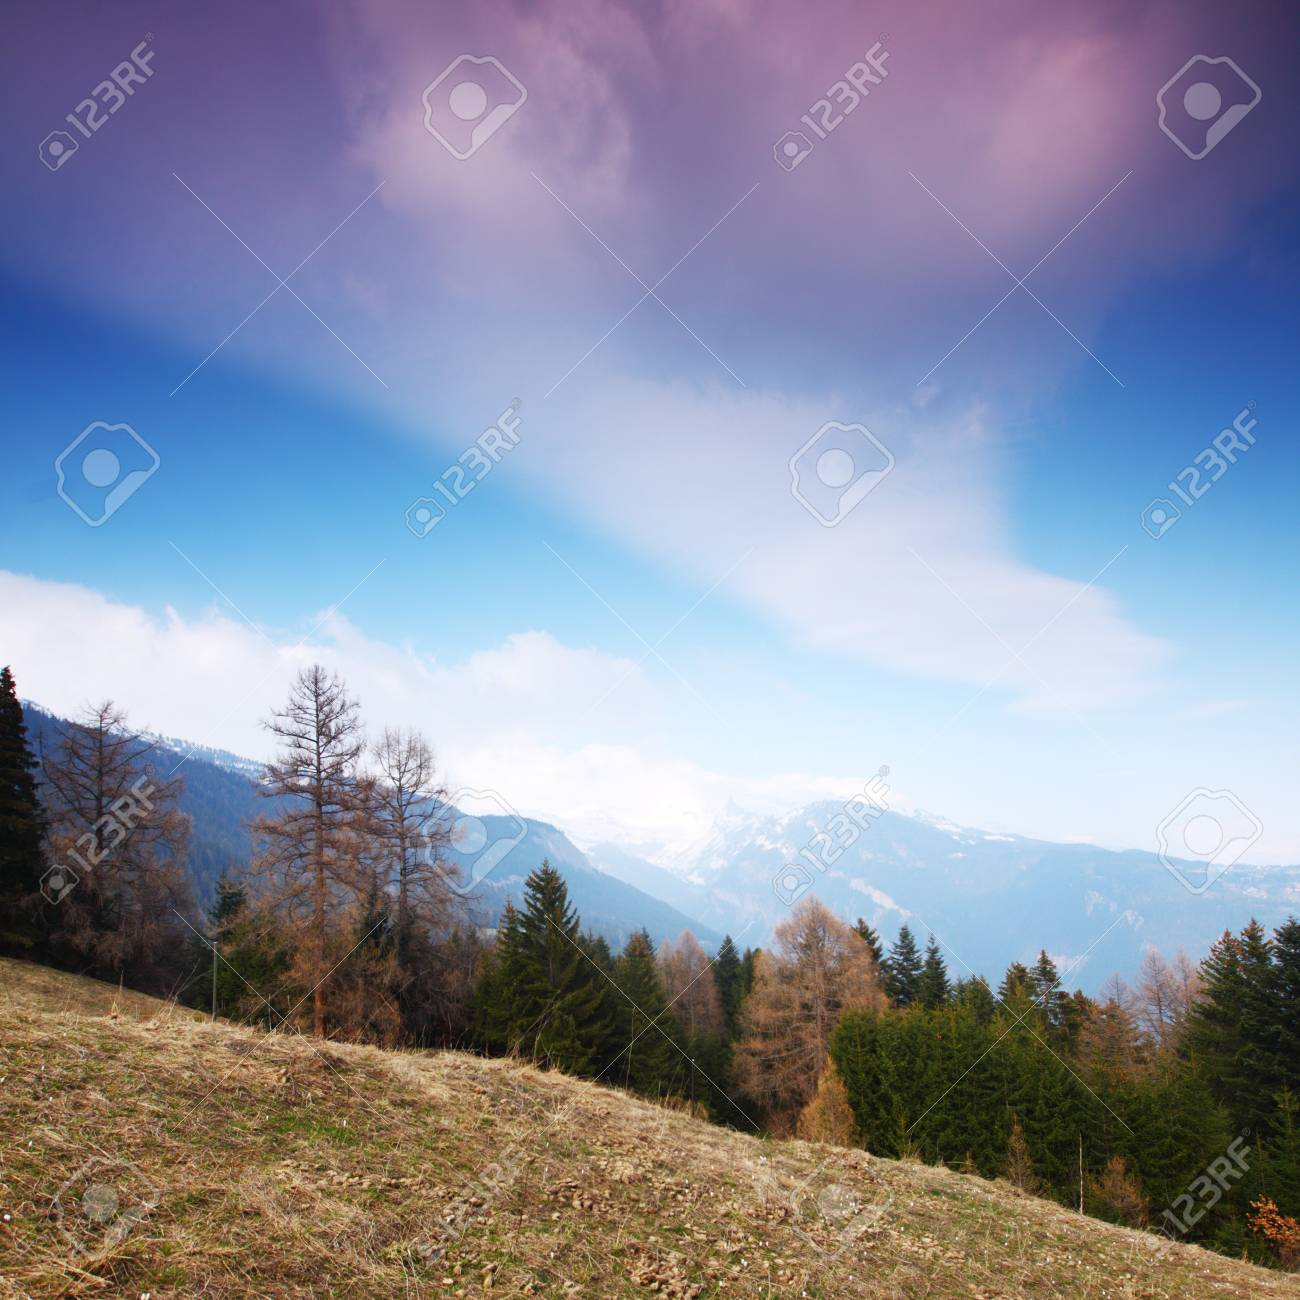 spring alps mountains scene background Stock Photo - 8453980